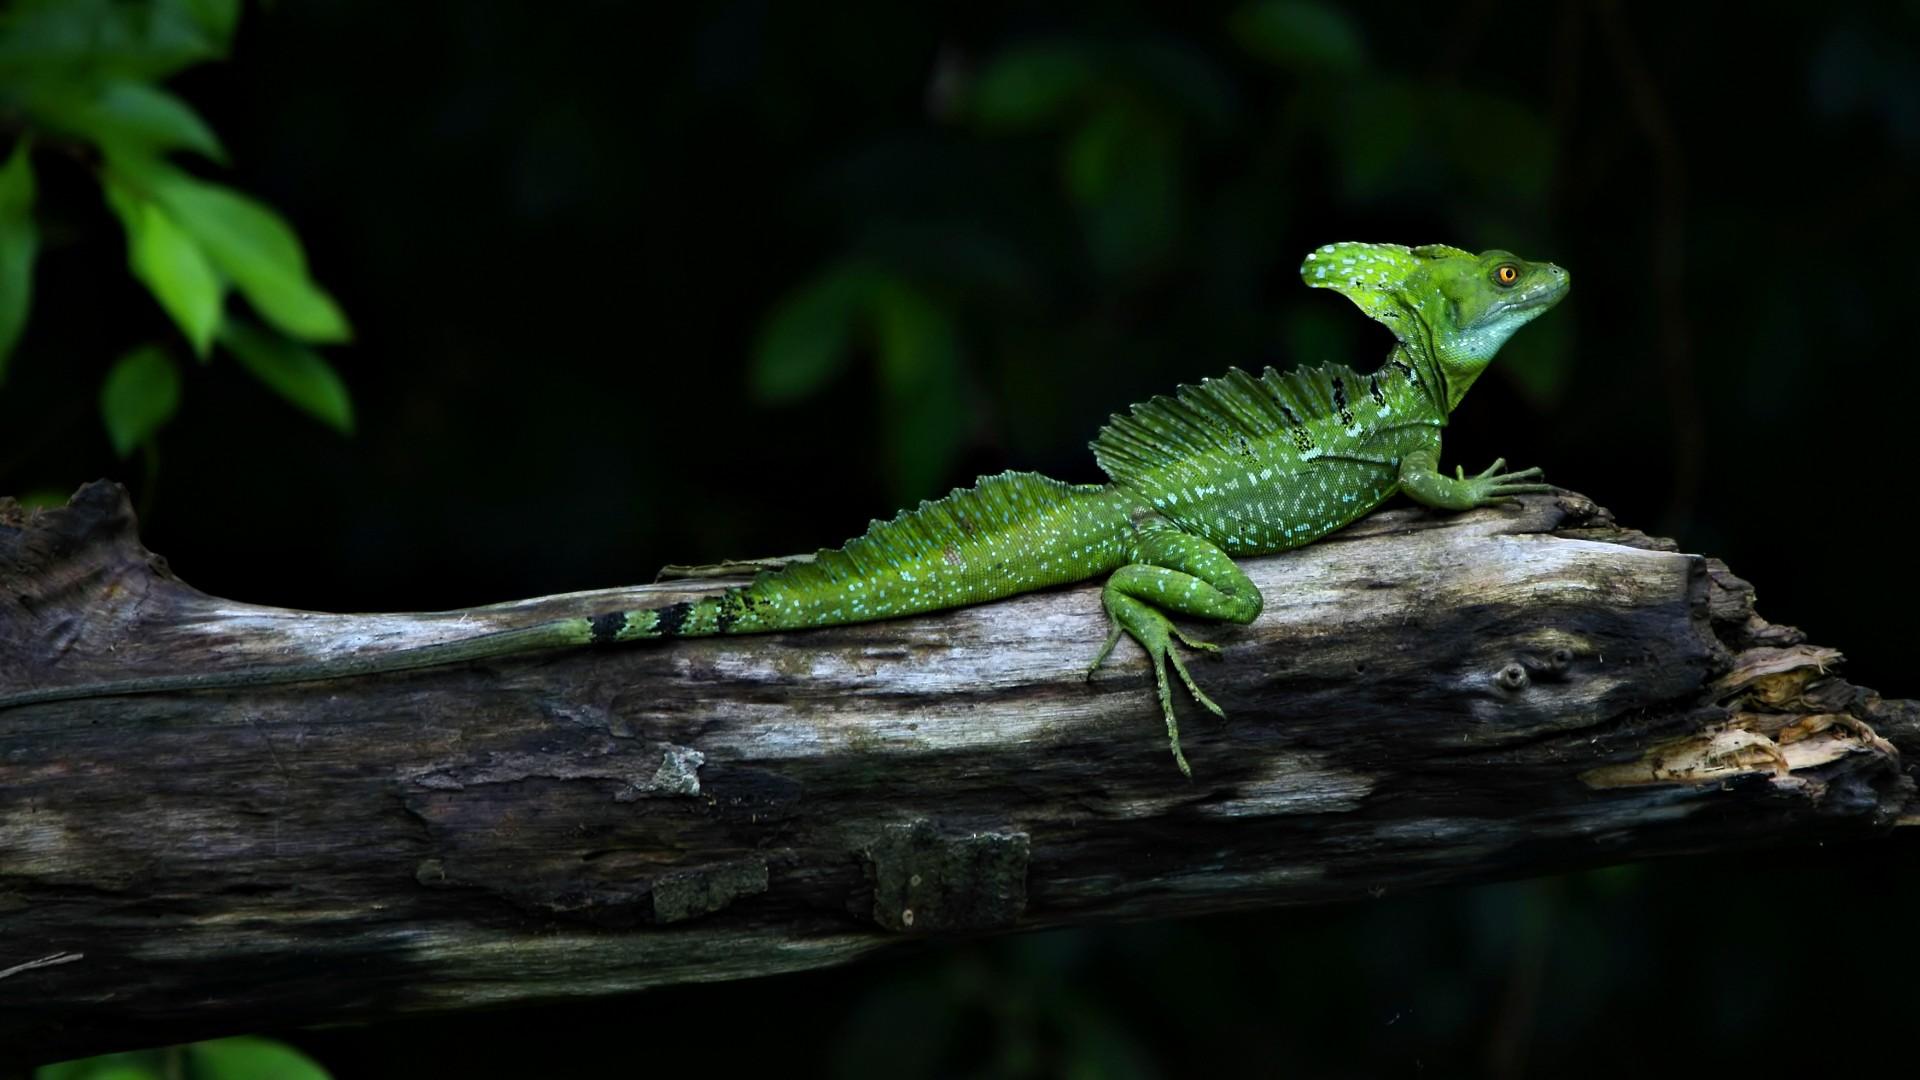 Free Lizard wallpaper 1920x1080 13127